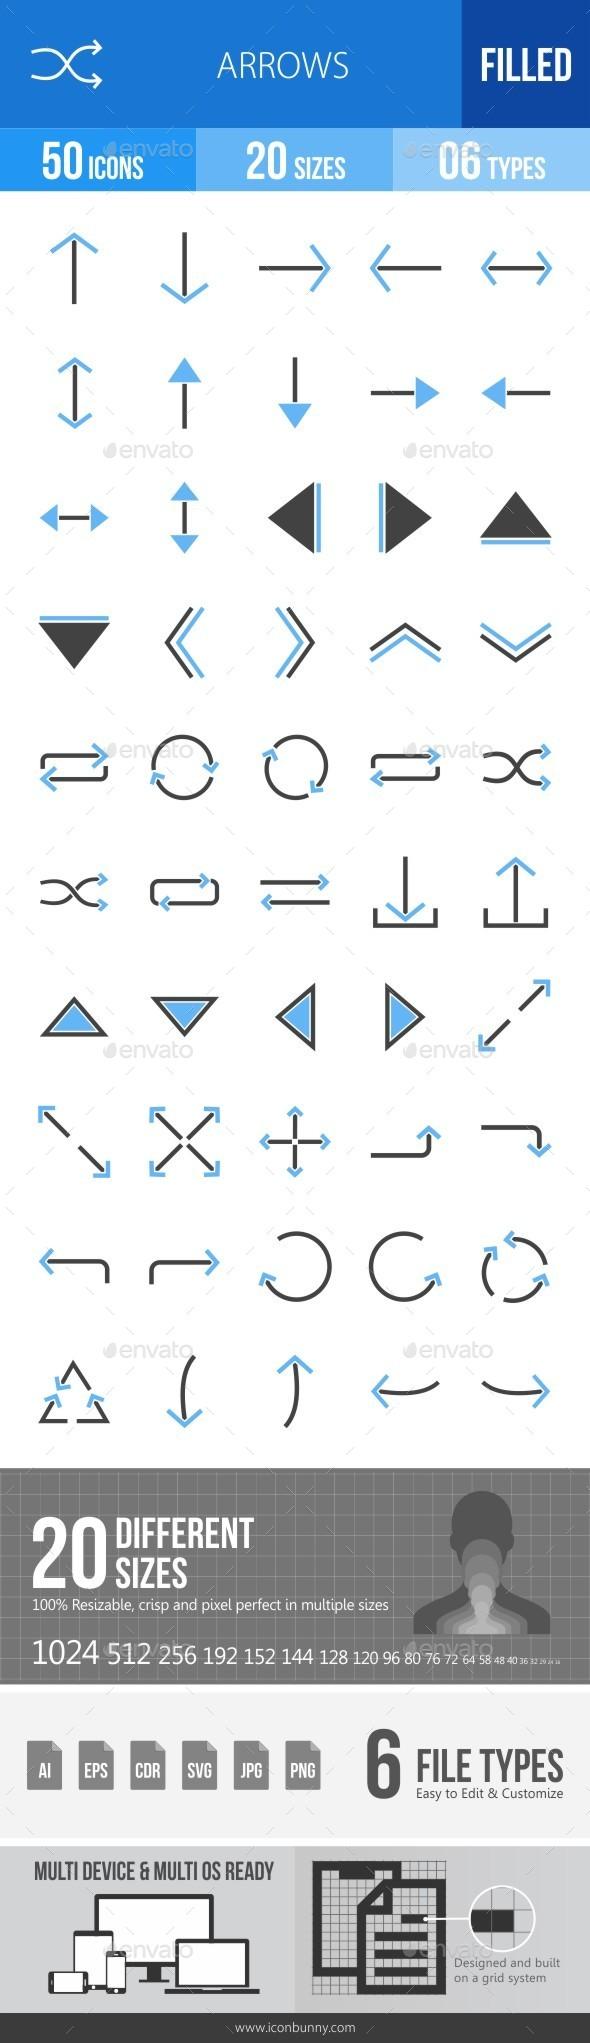 Arrows Blue & Black Icons - Icons